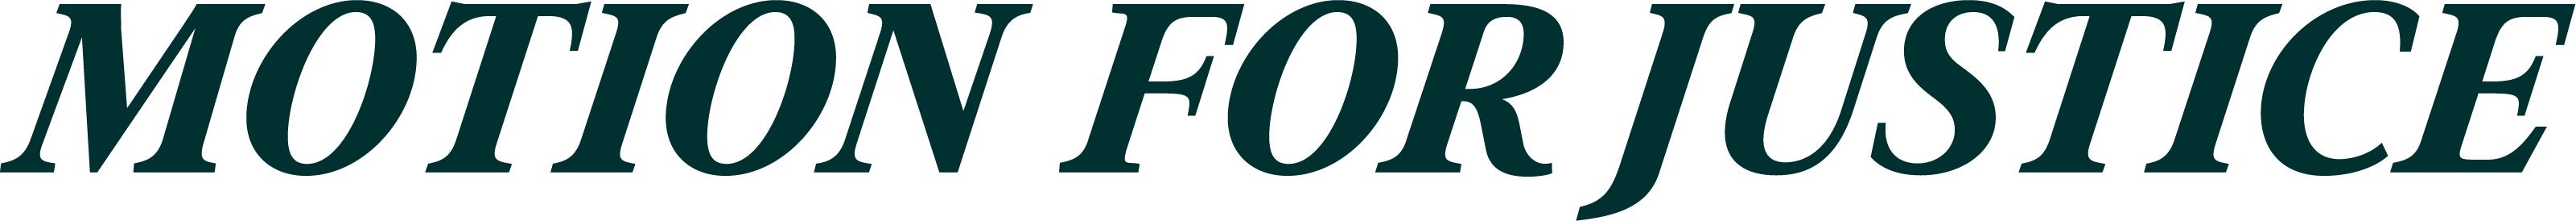 MFJ_Logo_Screen_Line_Darkgreen.png#asset:35302